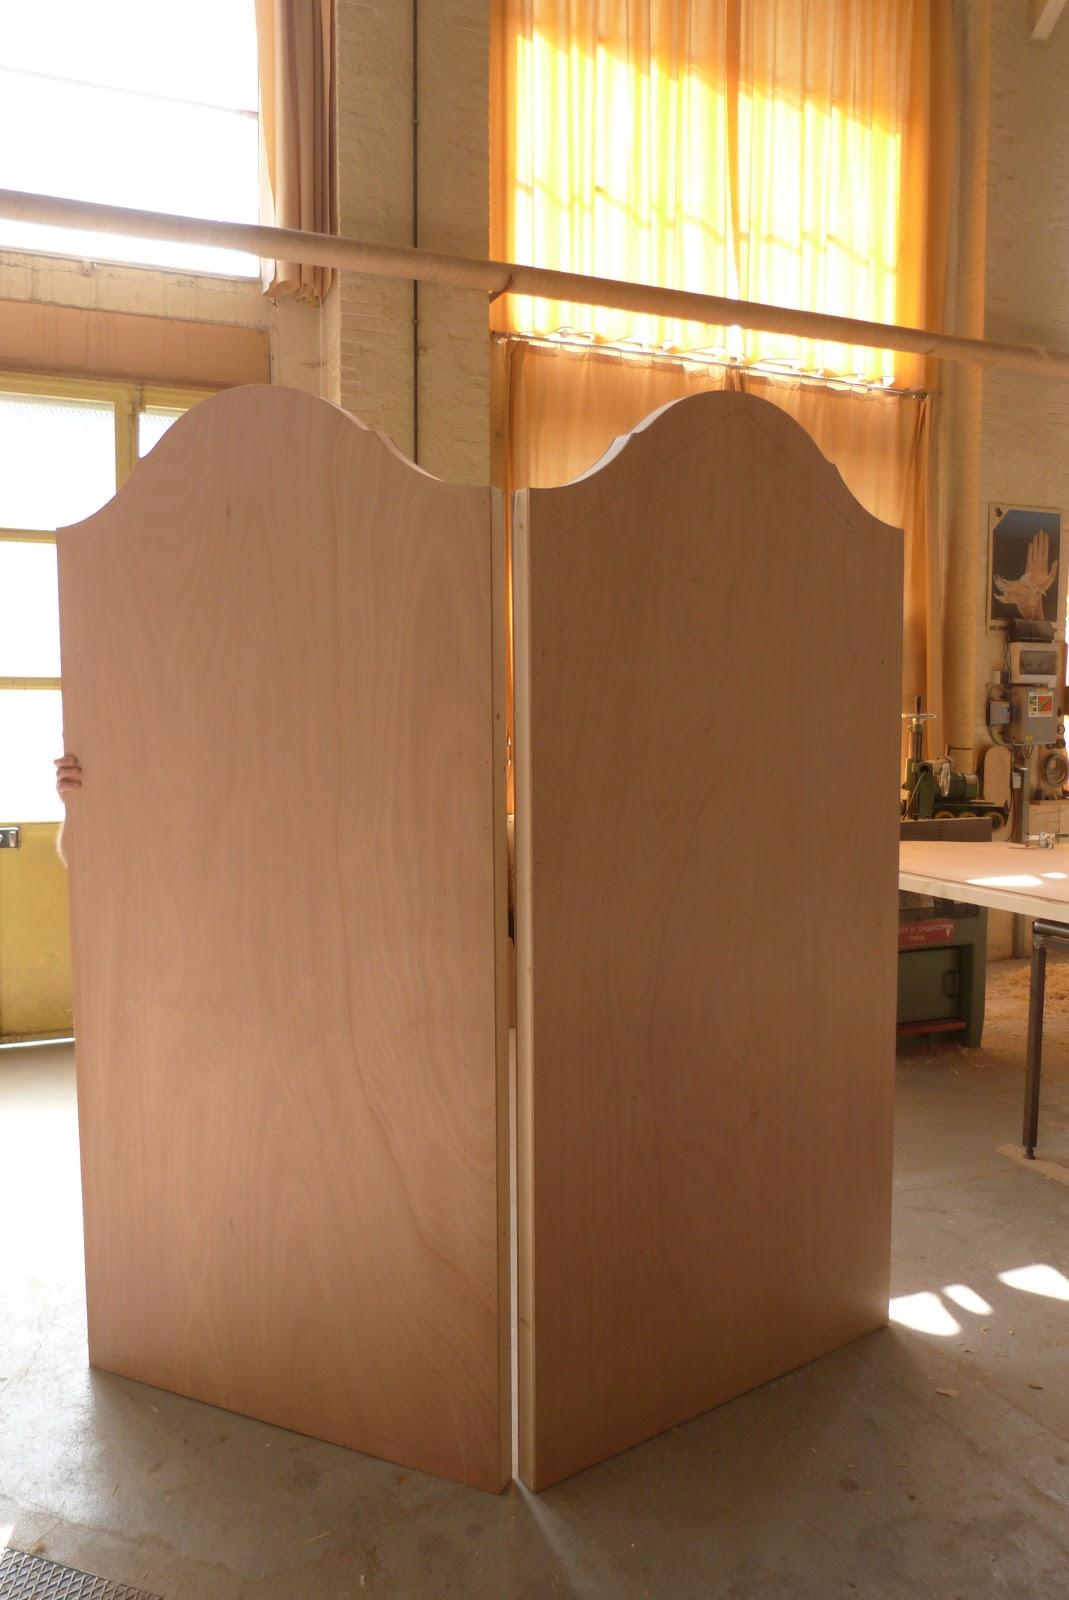 pauline dufour scenographies avril 2012. Black Bedroom Furniture Sets. Home Design Ideas